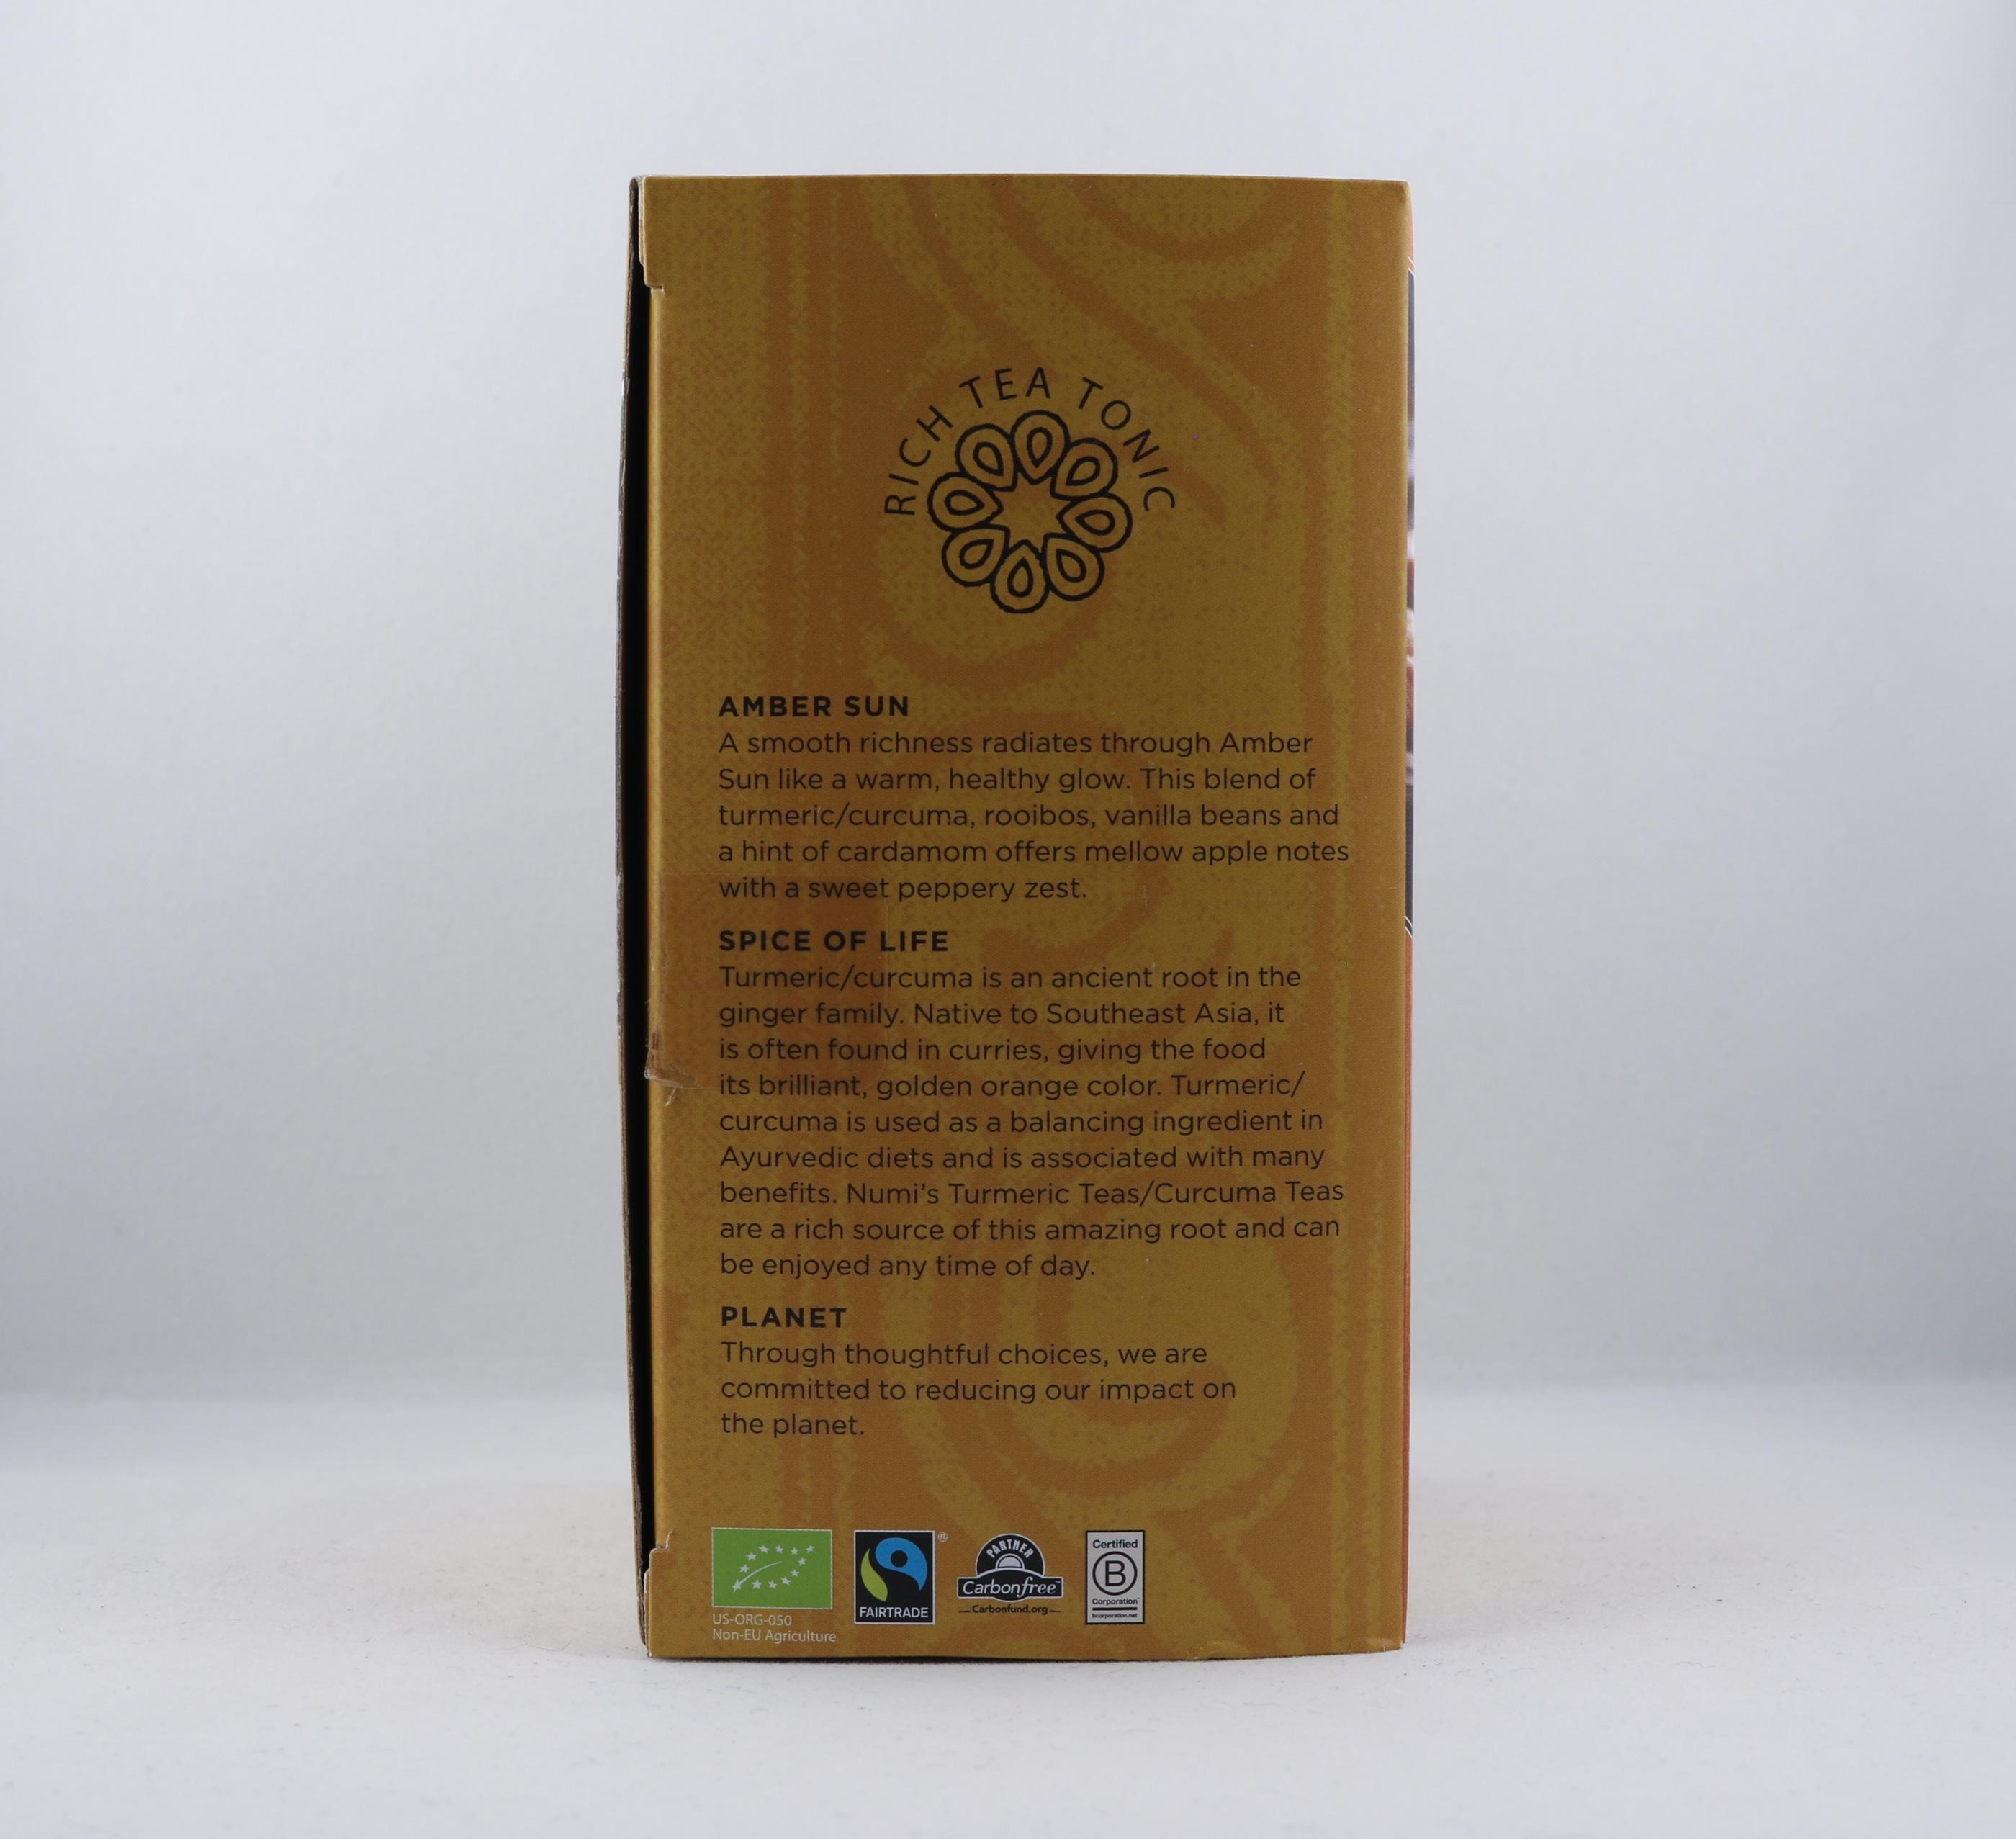 Turmeric Curcuma Amber Sun te Wellness Ayurveda Halmstadmassören Halmstad Sverige Sweden svensk eko ekologiskt fair labor fairtrade